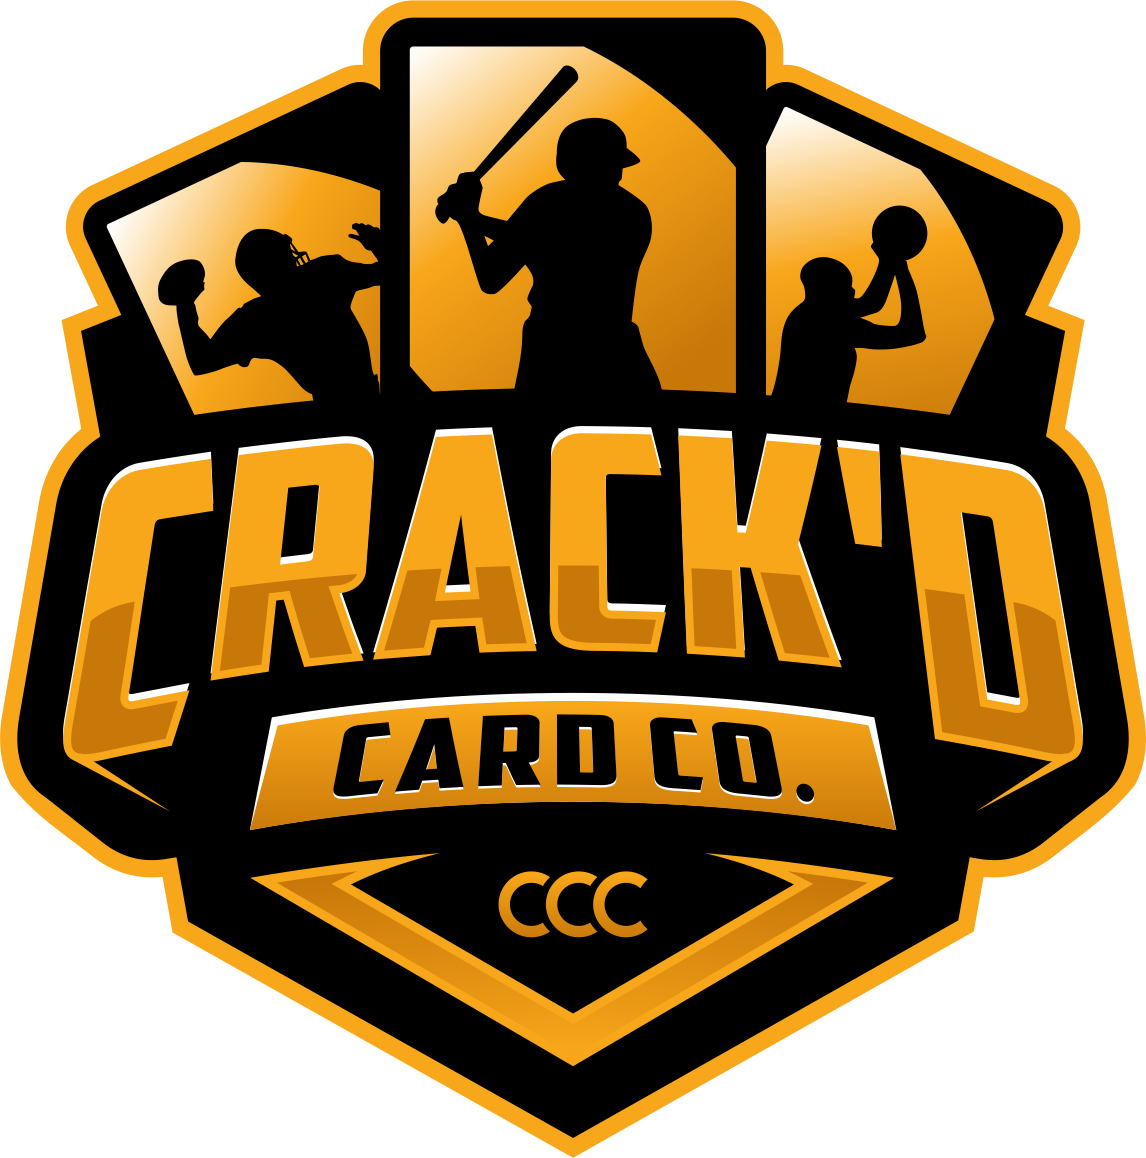 Crack'd Card Co. - Live Sports Card Breaks